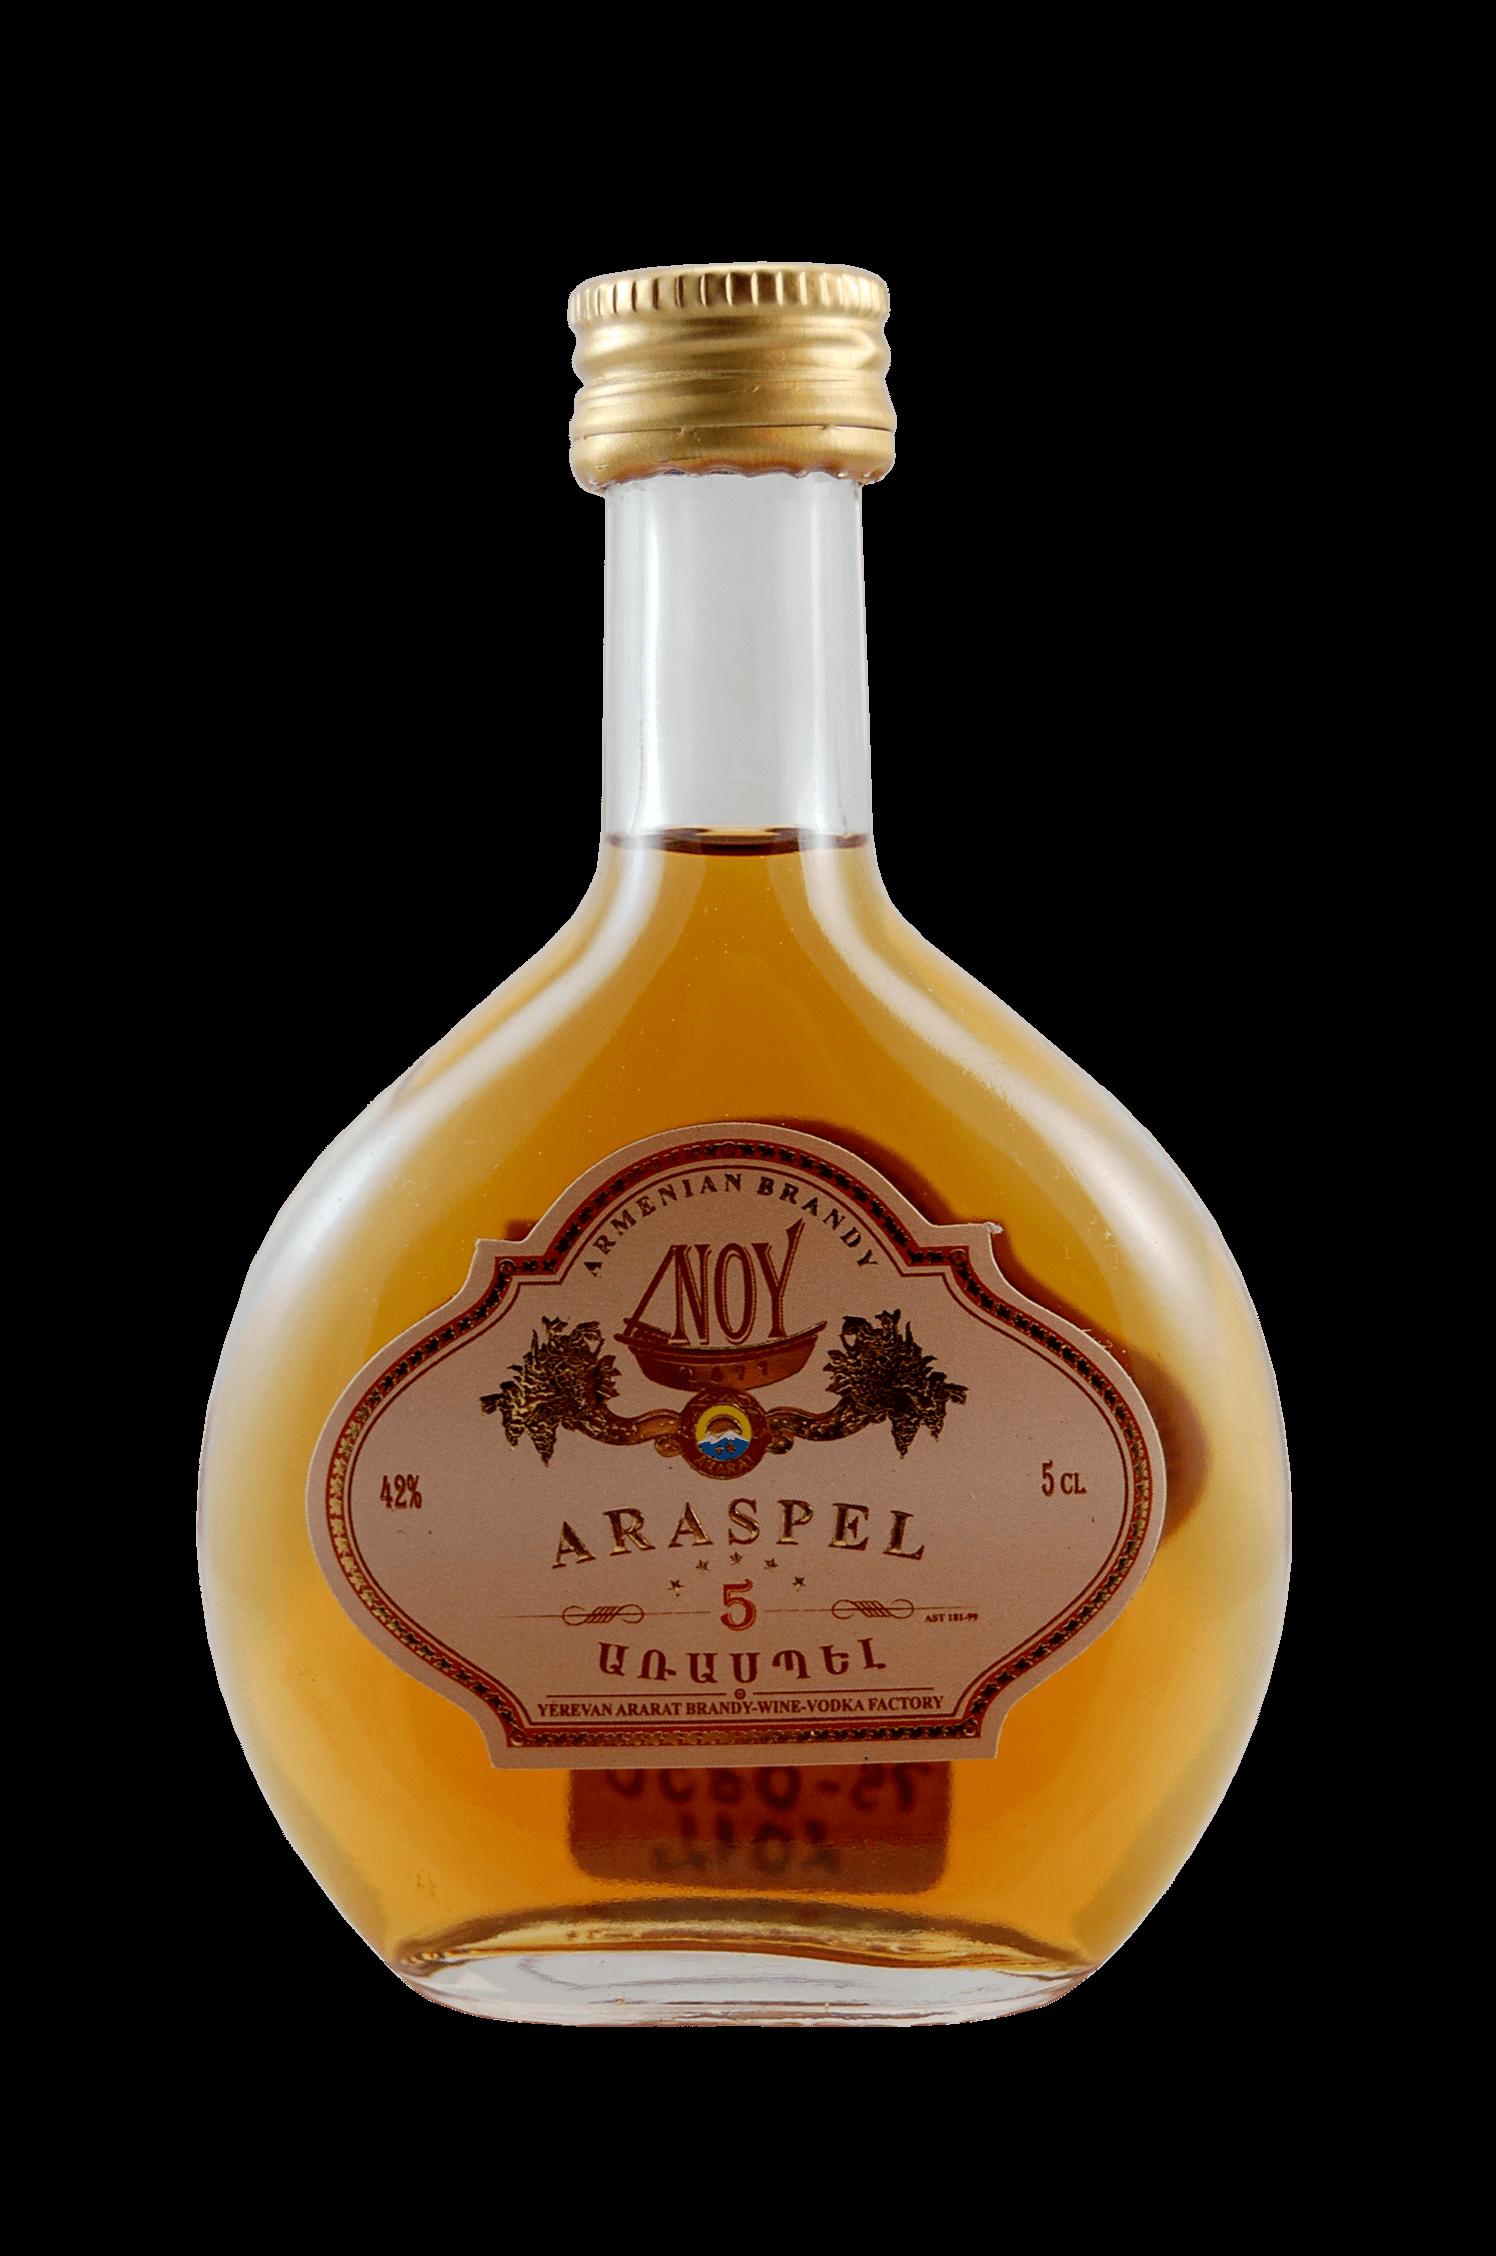 Araspel 5 Brandy